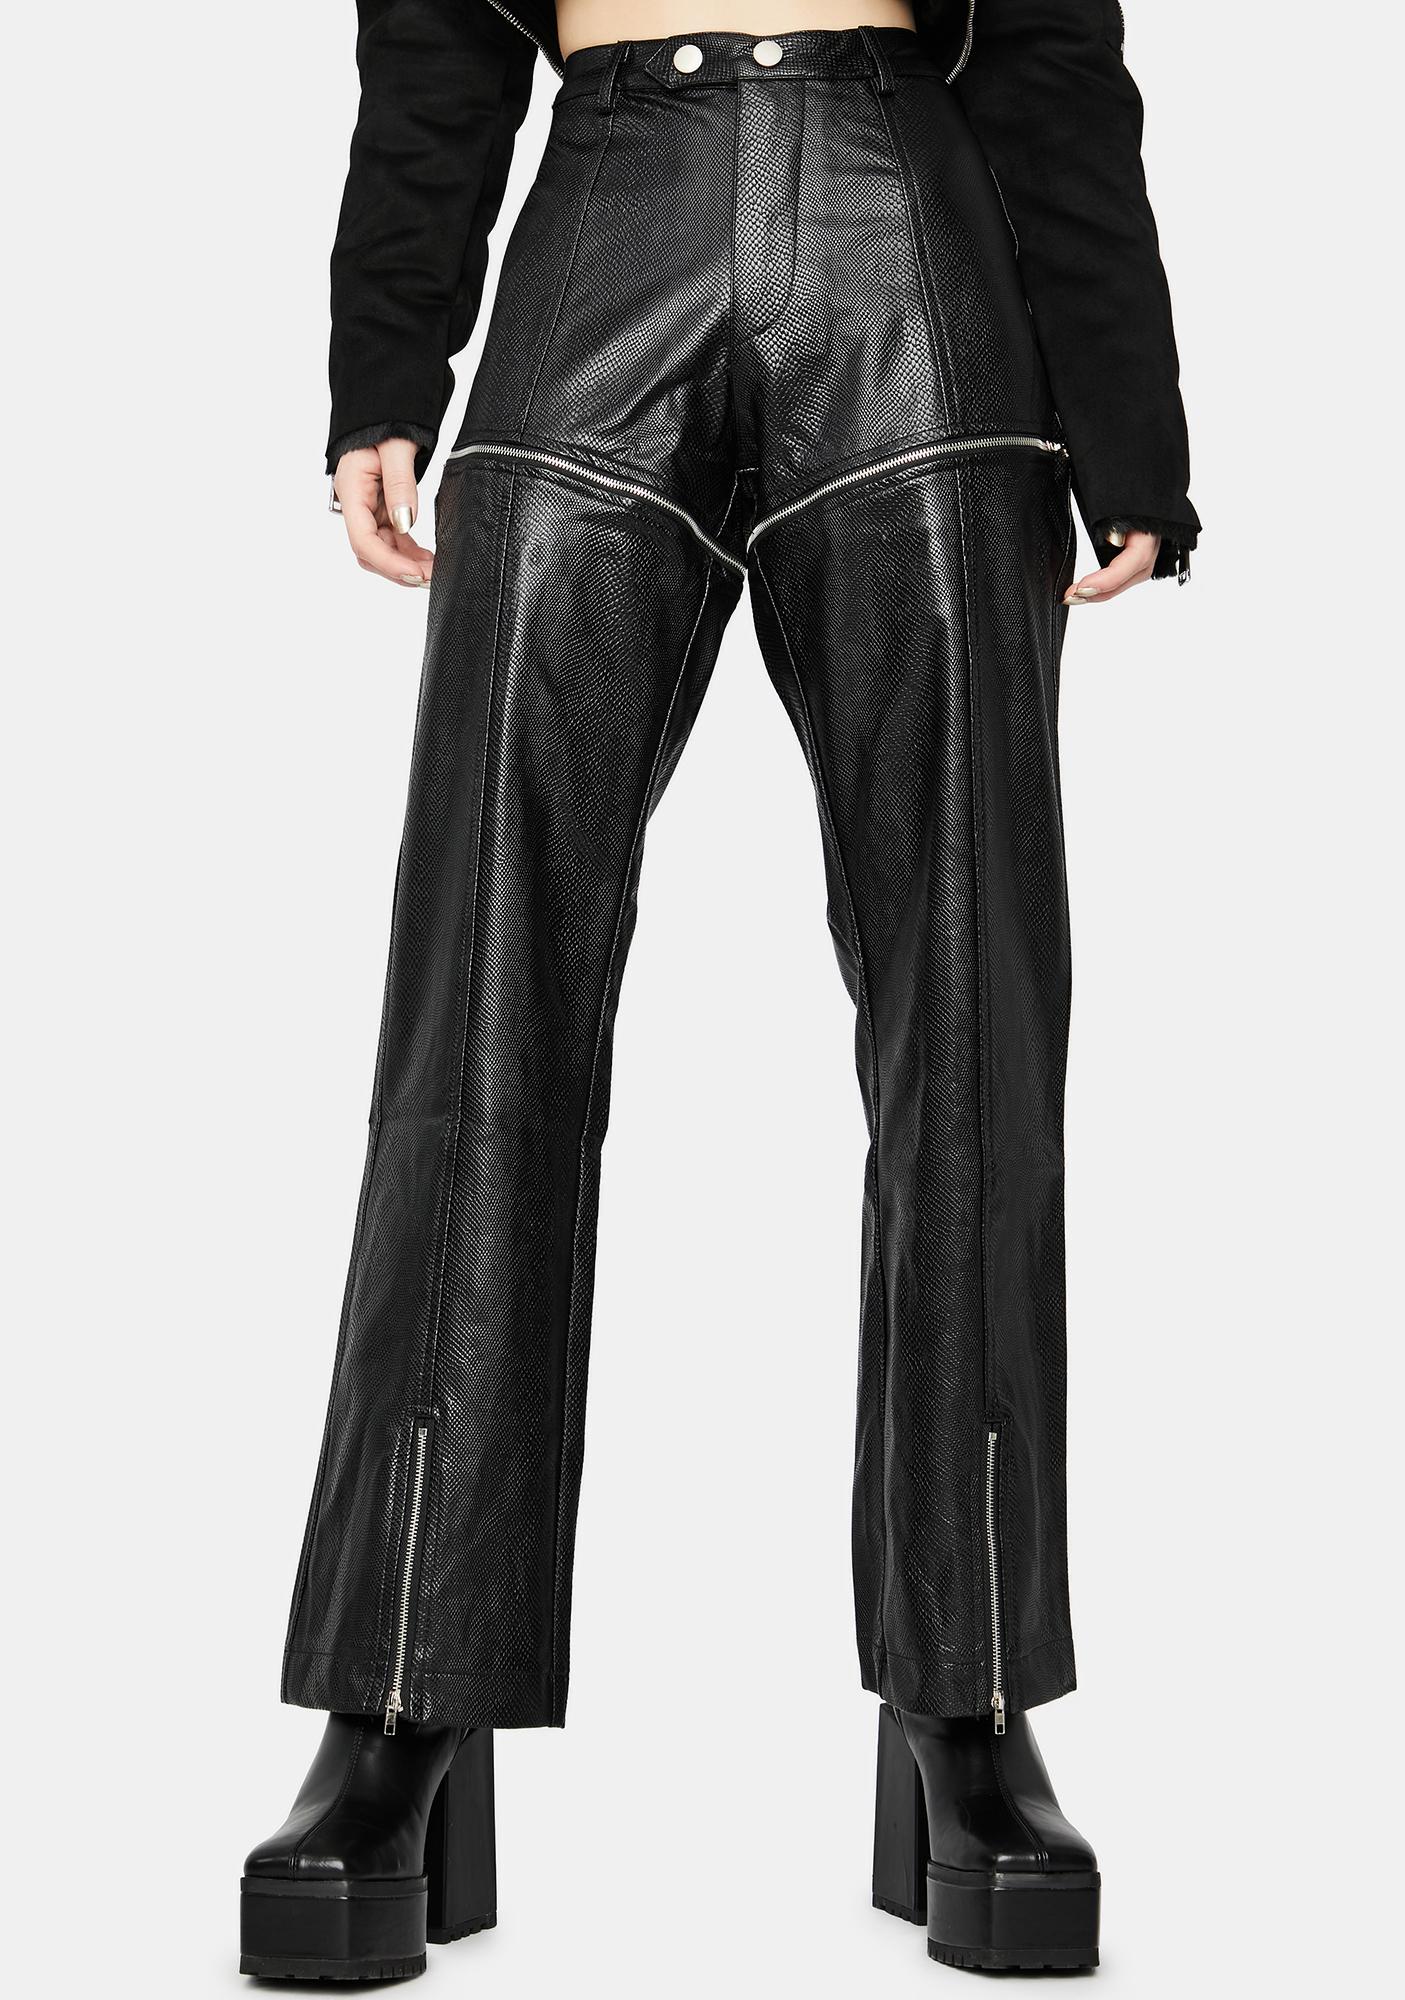 Moto Mission Vegan Leather Zip-Off Pants